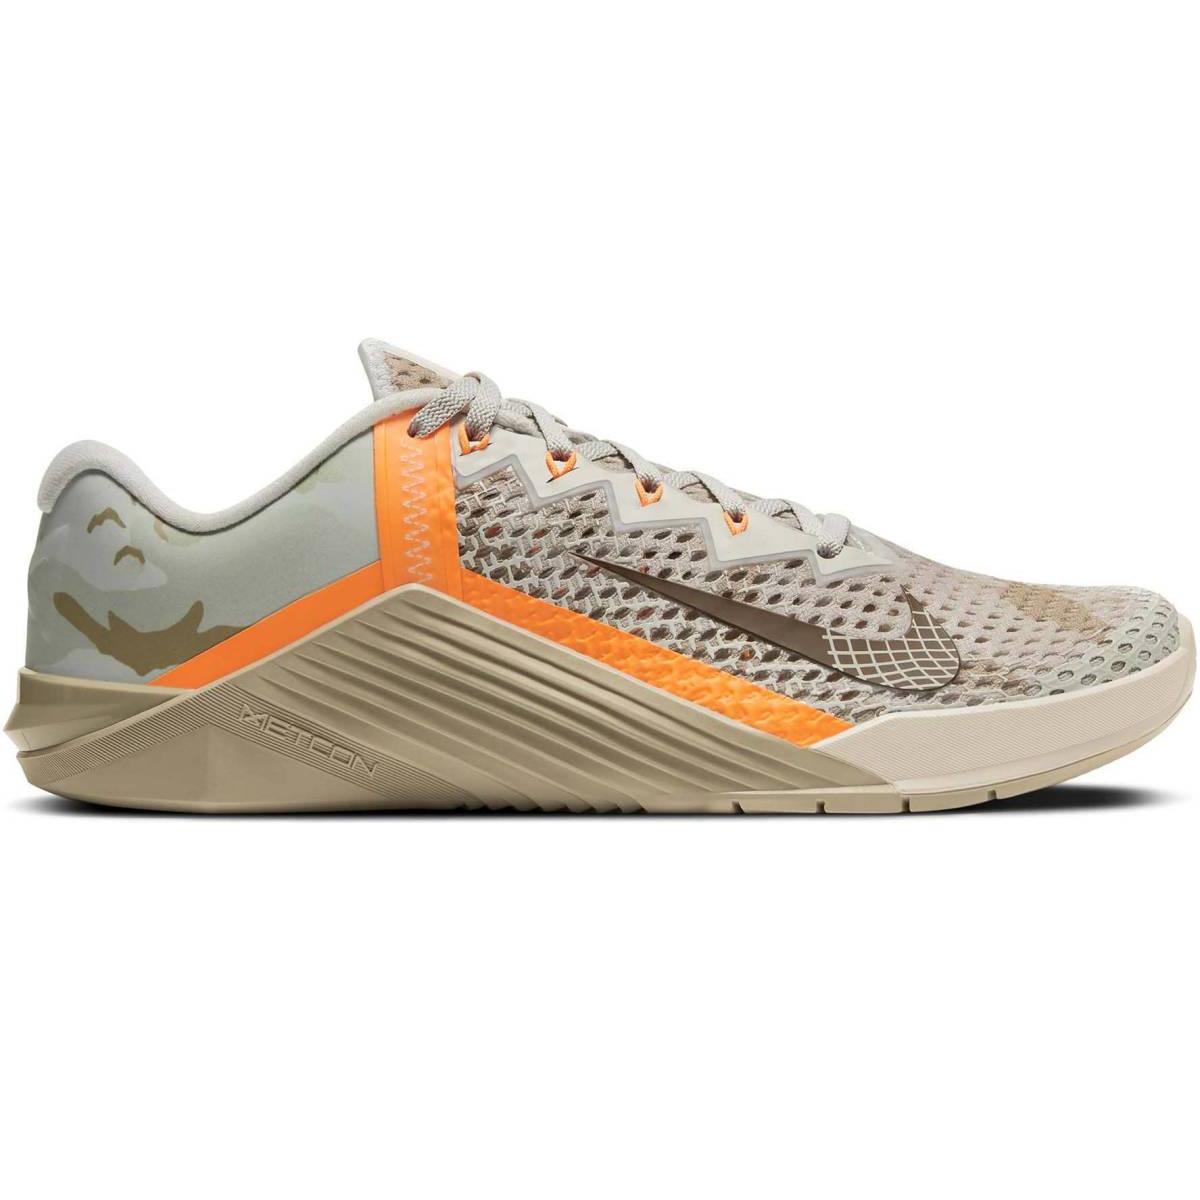 Nike Metcon 6 Trainingsschuh Fitness grau orange camo CK9388 028